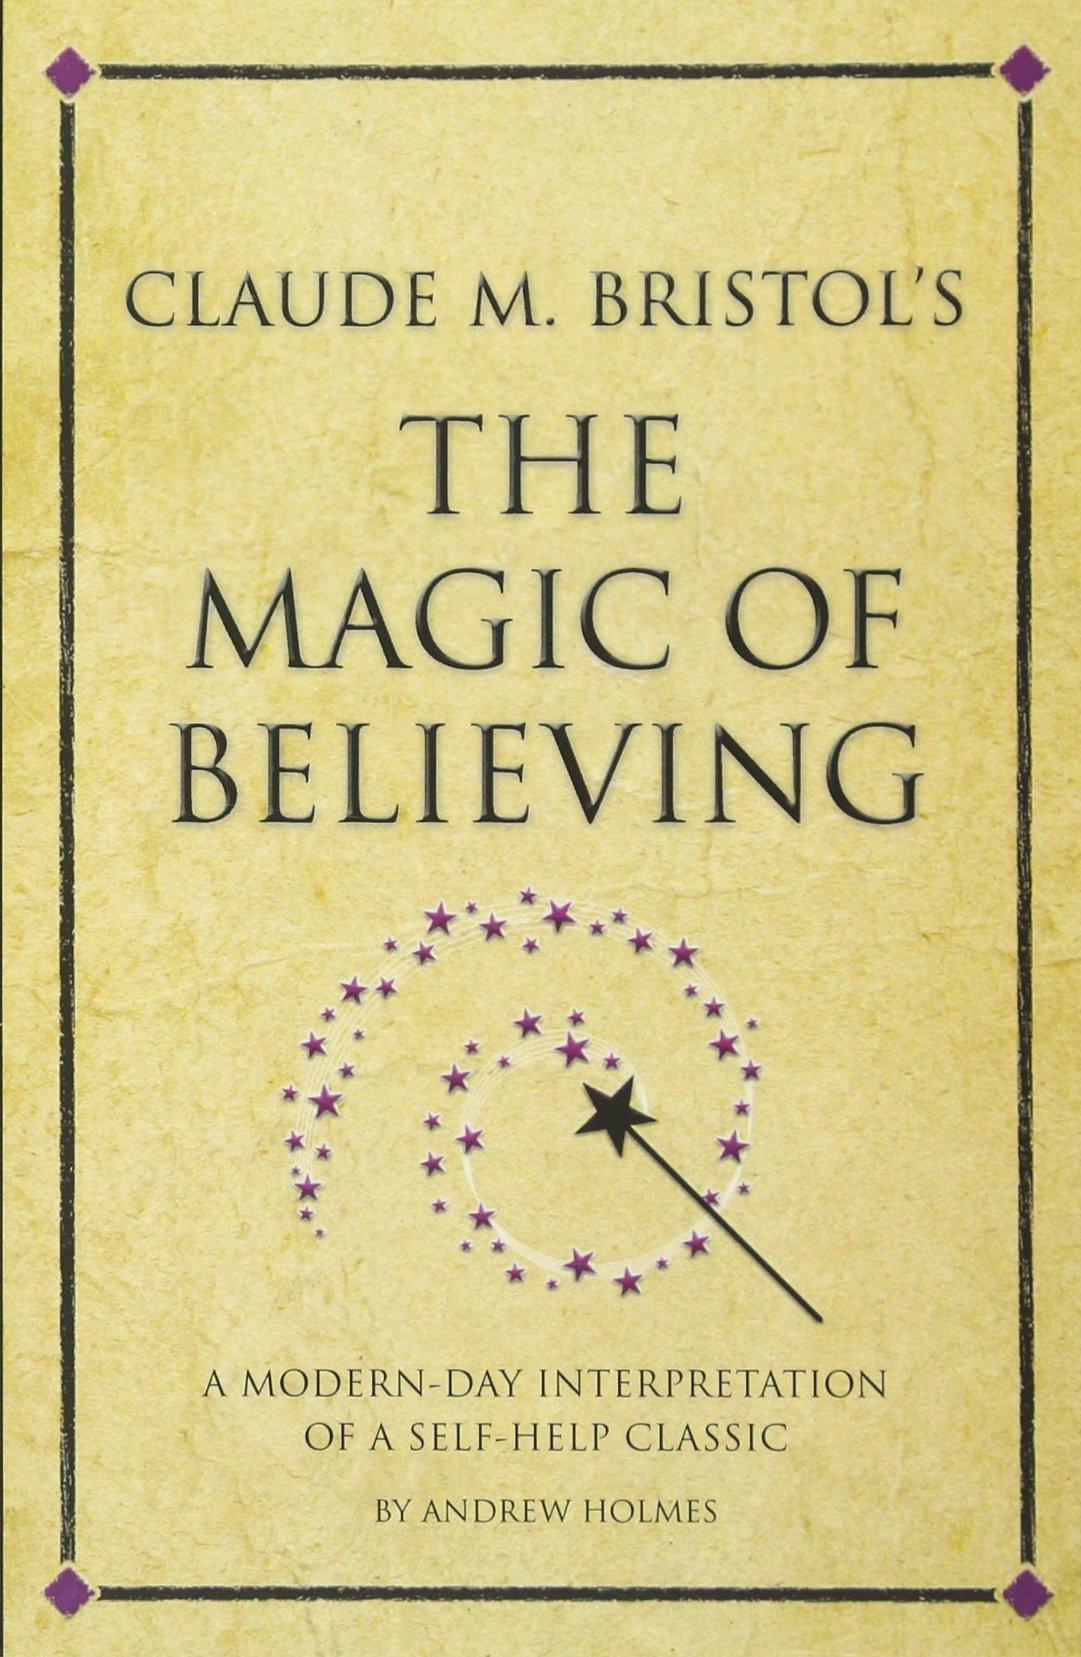 Claude M. Bristol's The Magic of Believing: A Modern-Day Interpretation Of Self-Help Classic (Infinite Success) ebook